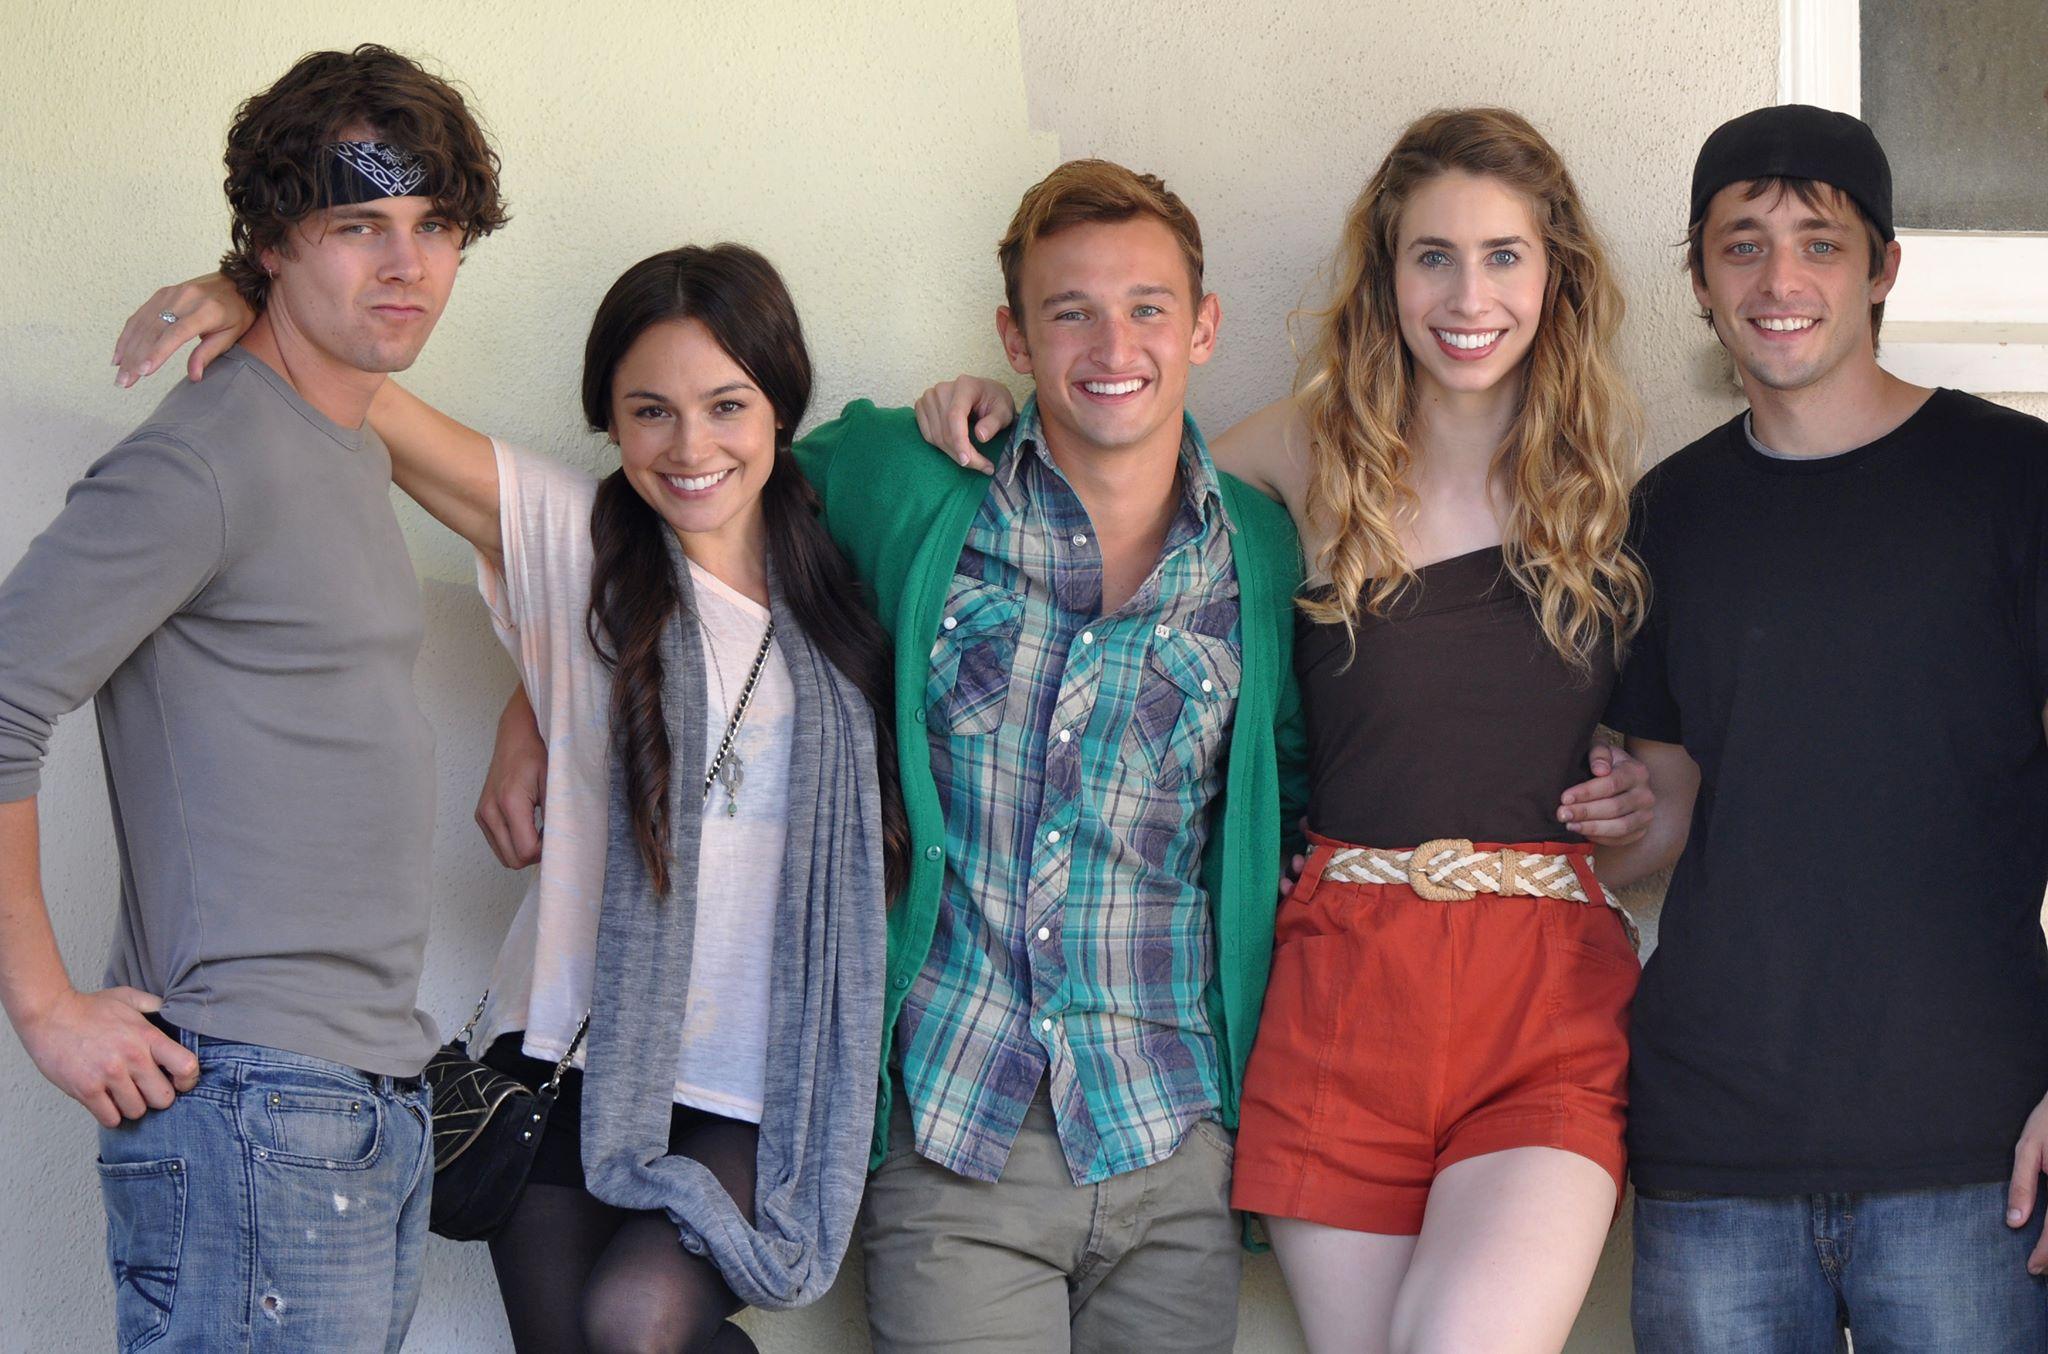 Jessica Lee Keller, Riley Bodenstab, Ben Adams, Grace Folsom, and Kent Boyd in Schoooled (2013)